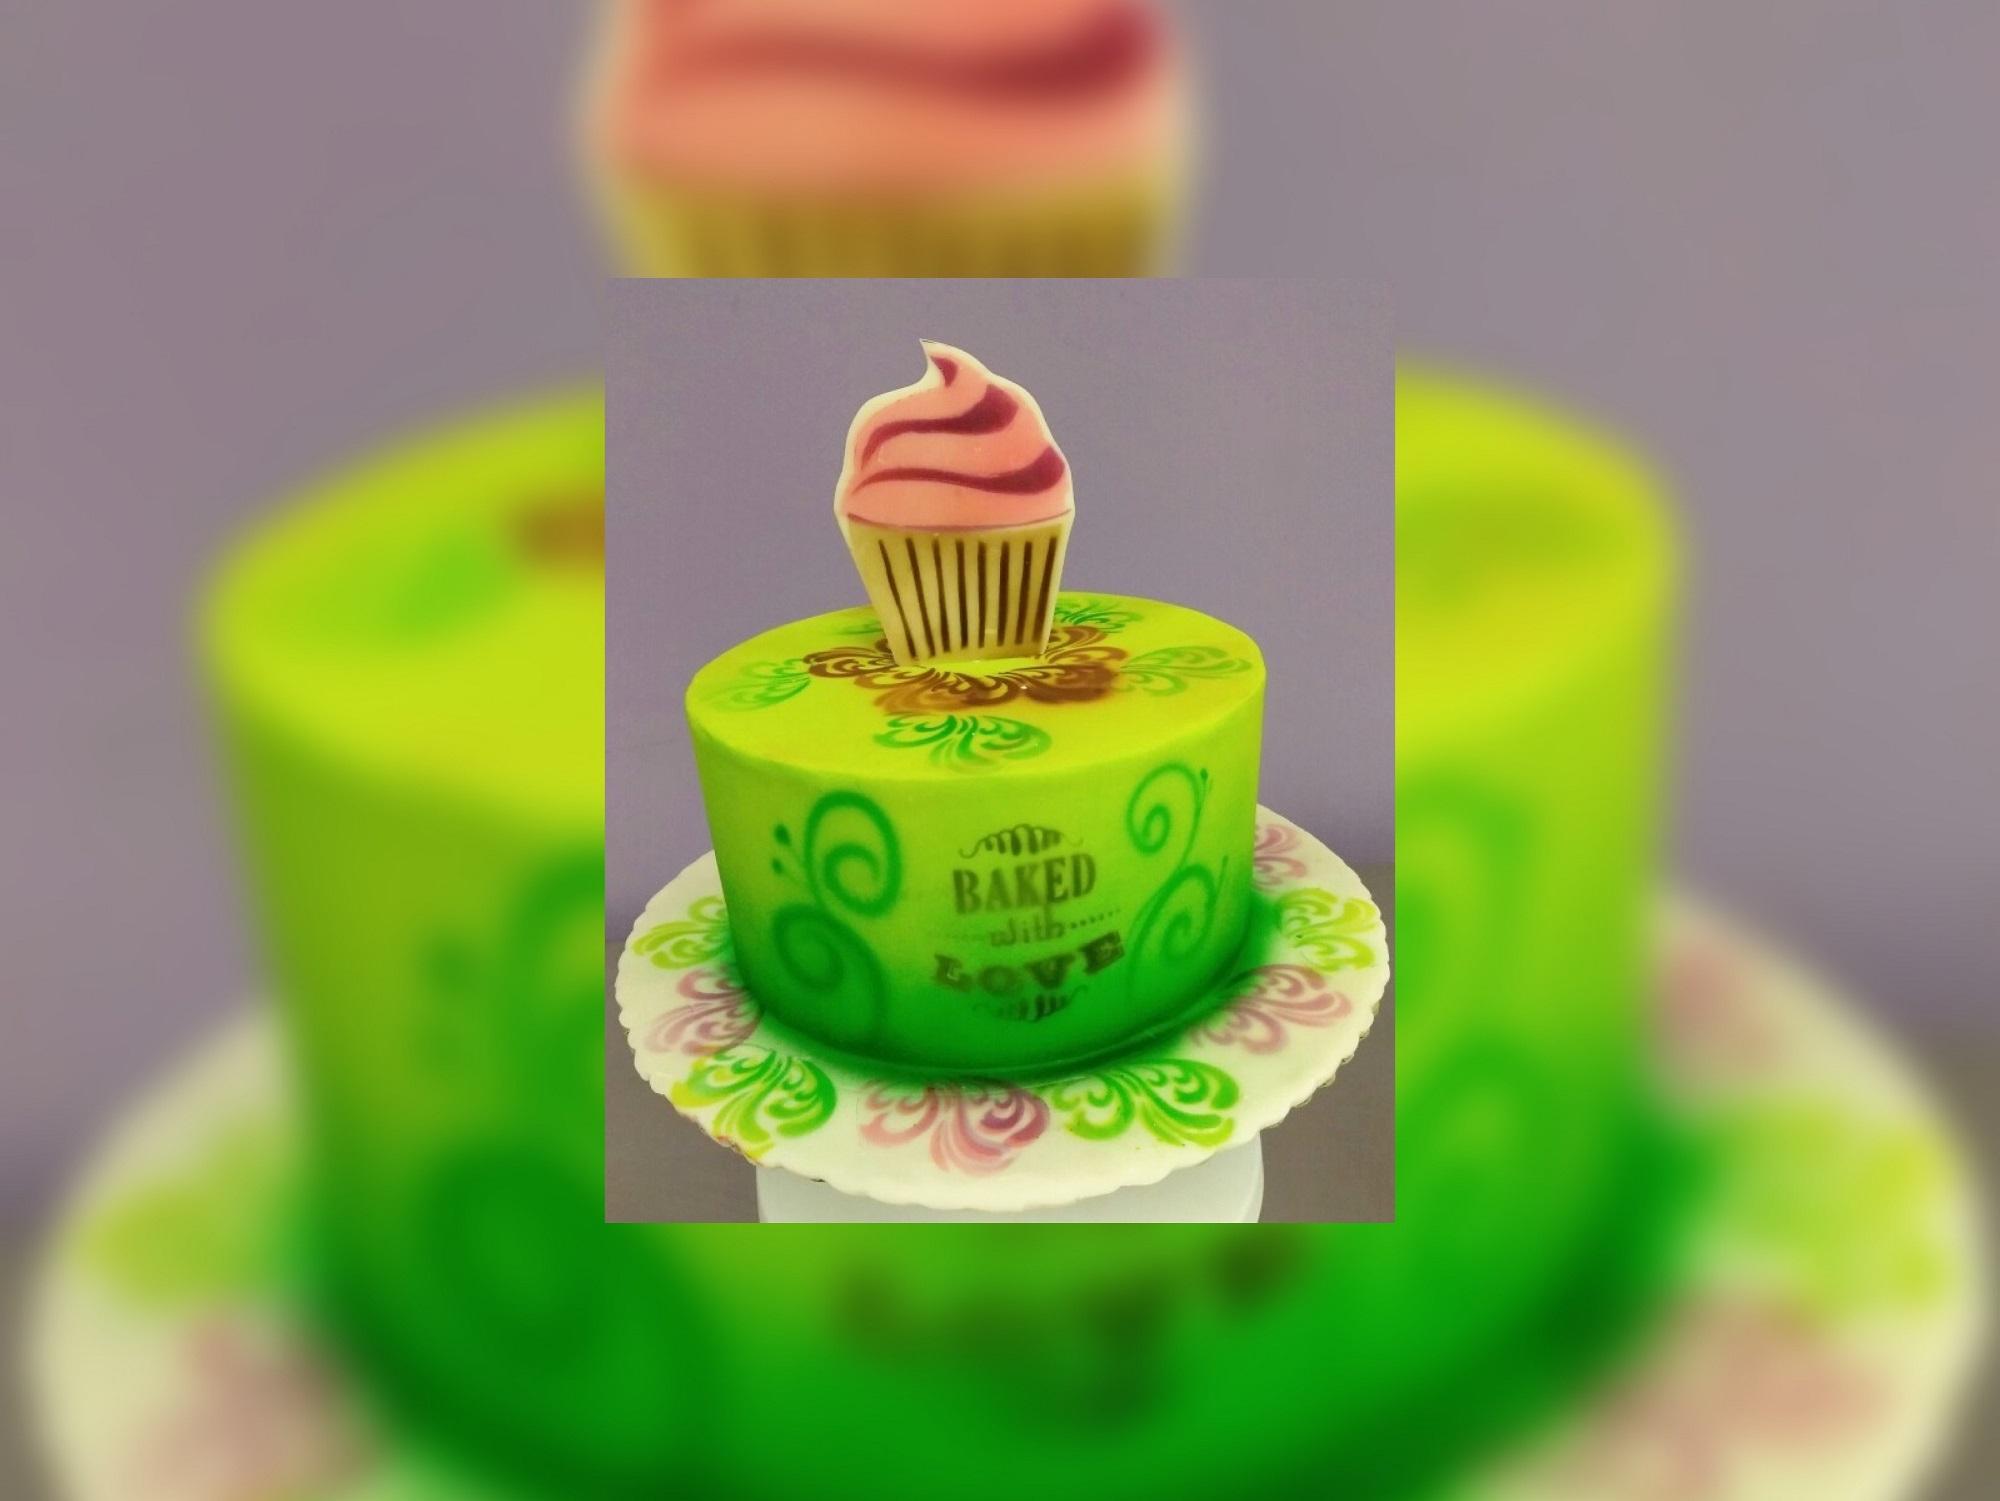 Airbrush Basics Cake